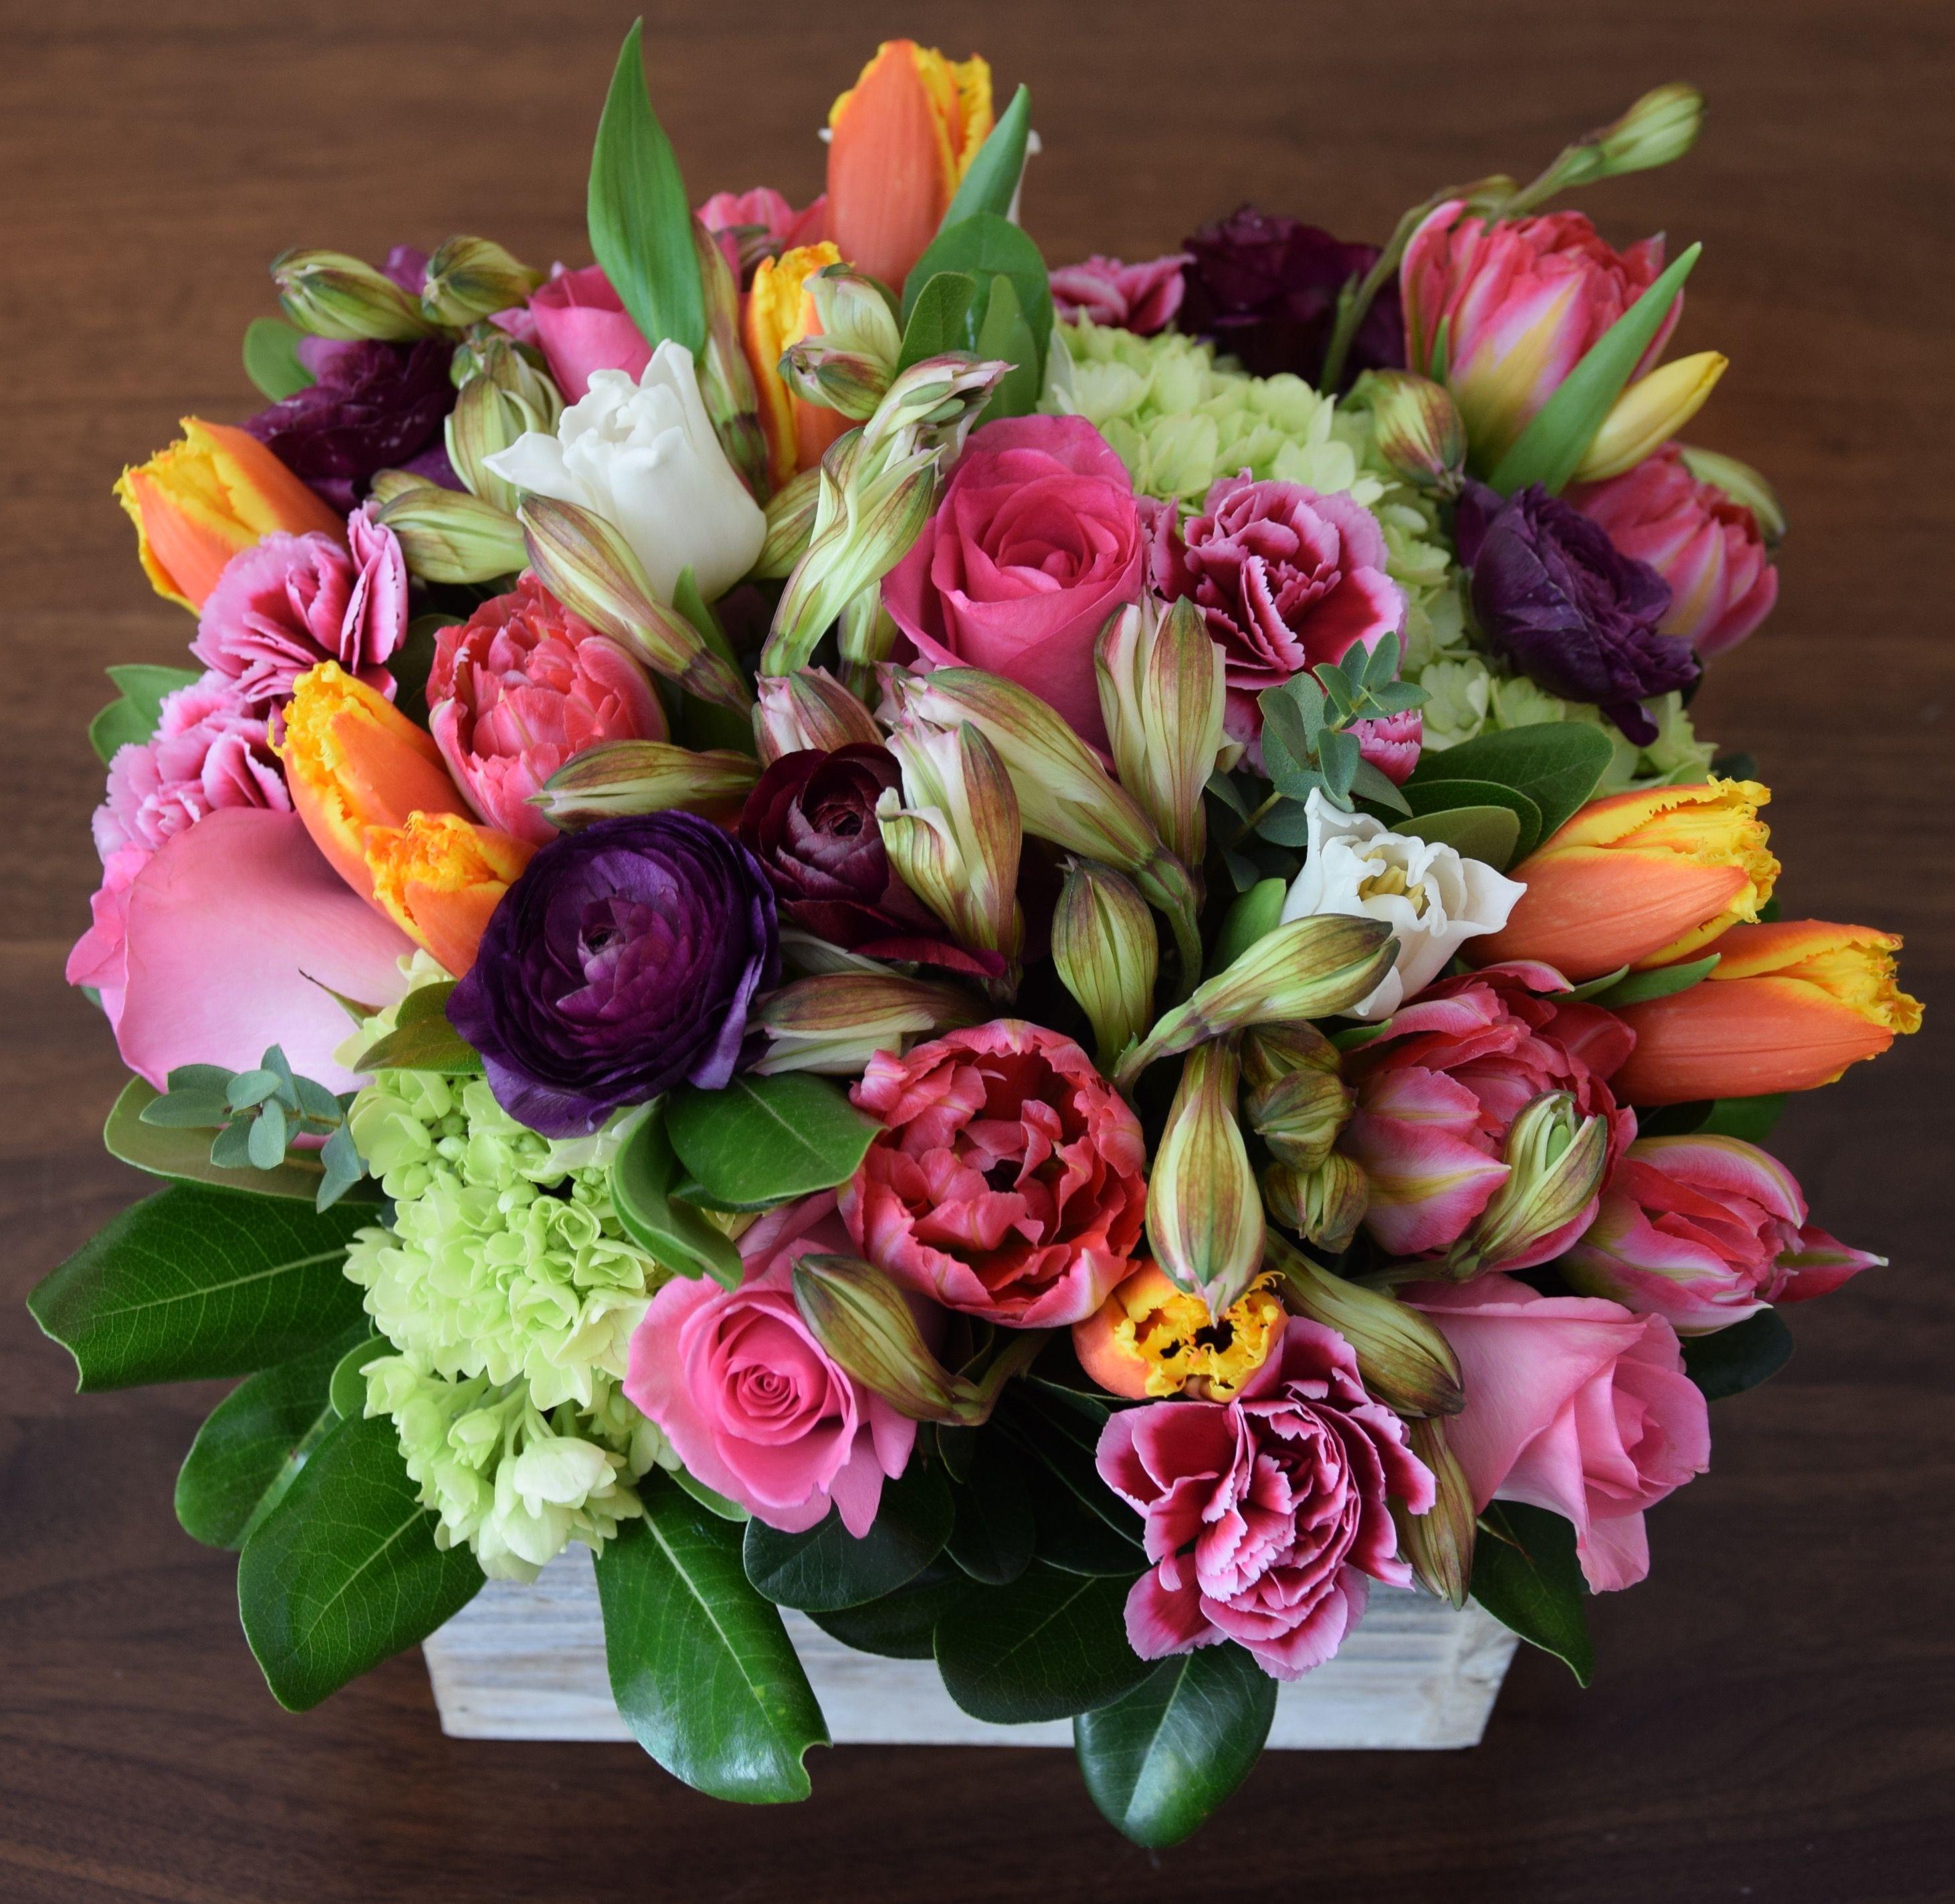 Flower Arrangement In A Wooden Box With Lots Of Florals Tulips Hydrangeas Ranunculus Ro Fresh Flowers Arrangements Flower Arrangements Spring Arrangements